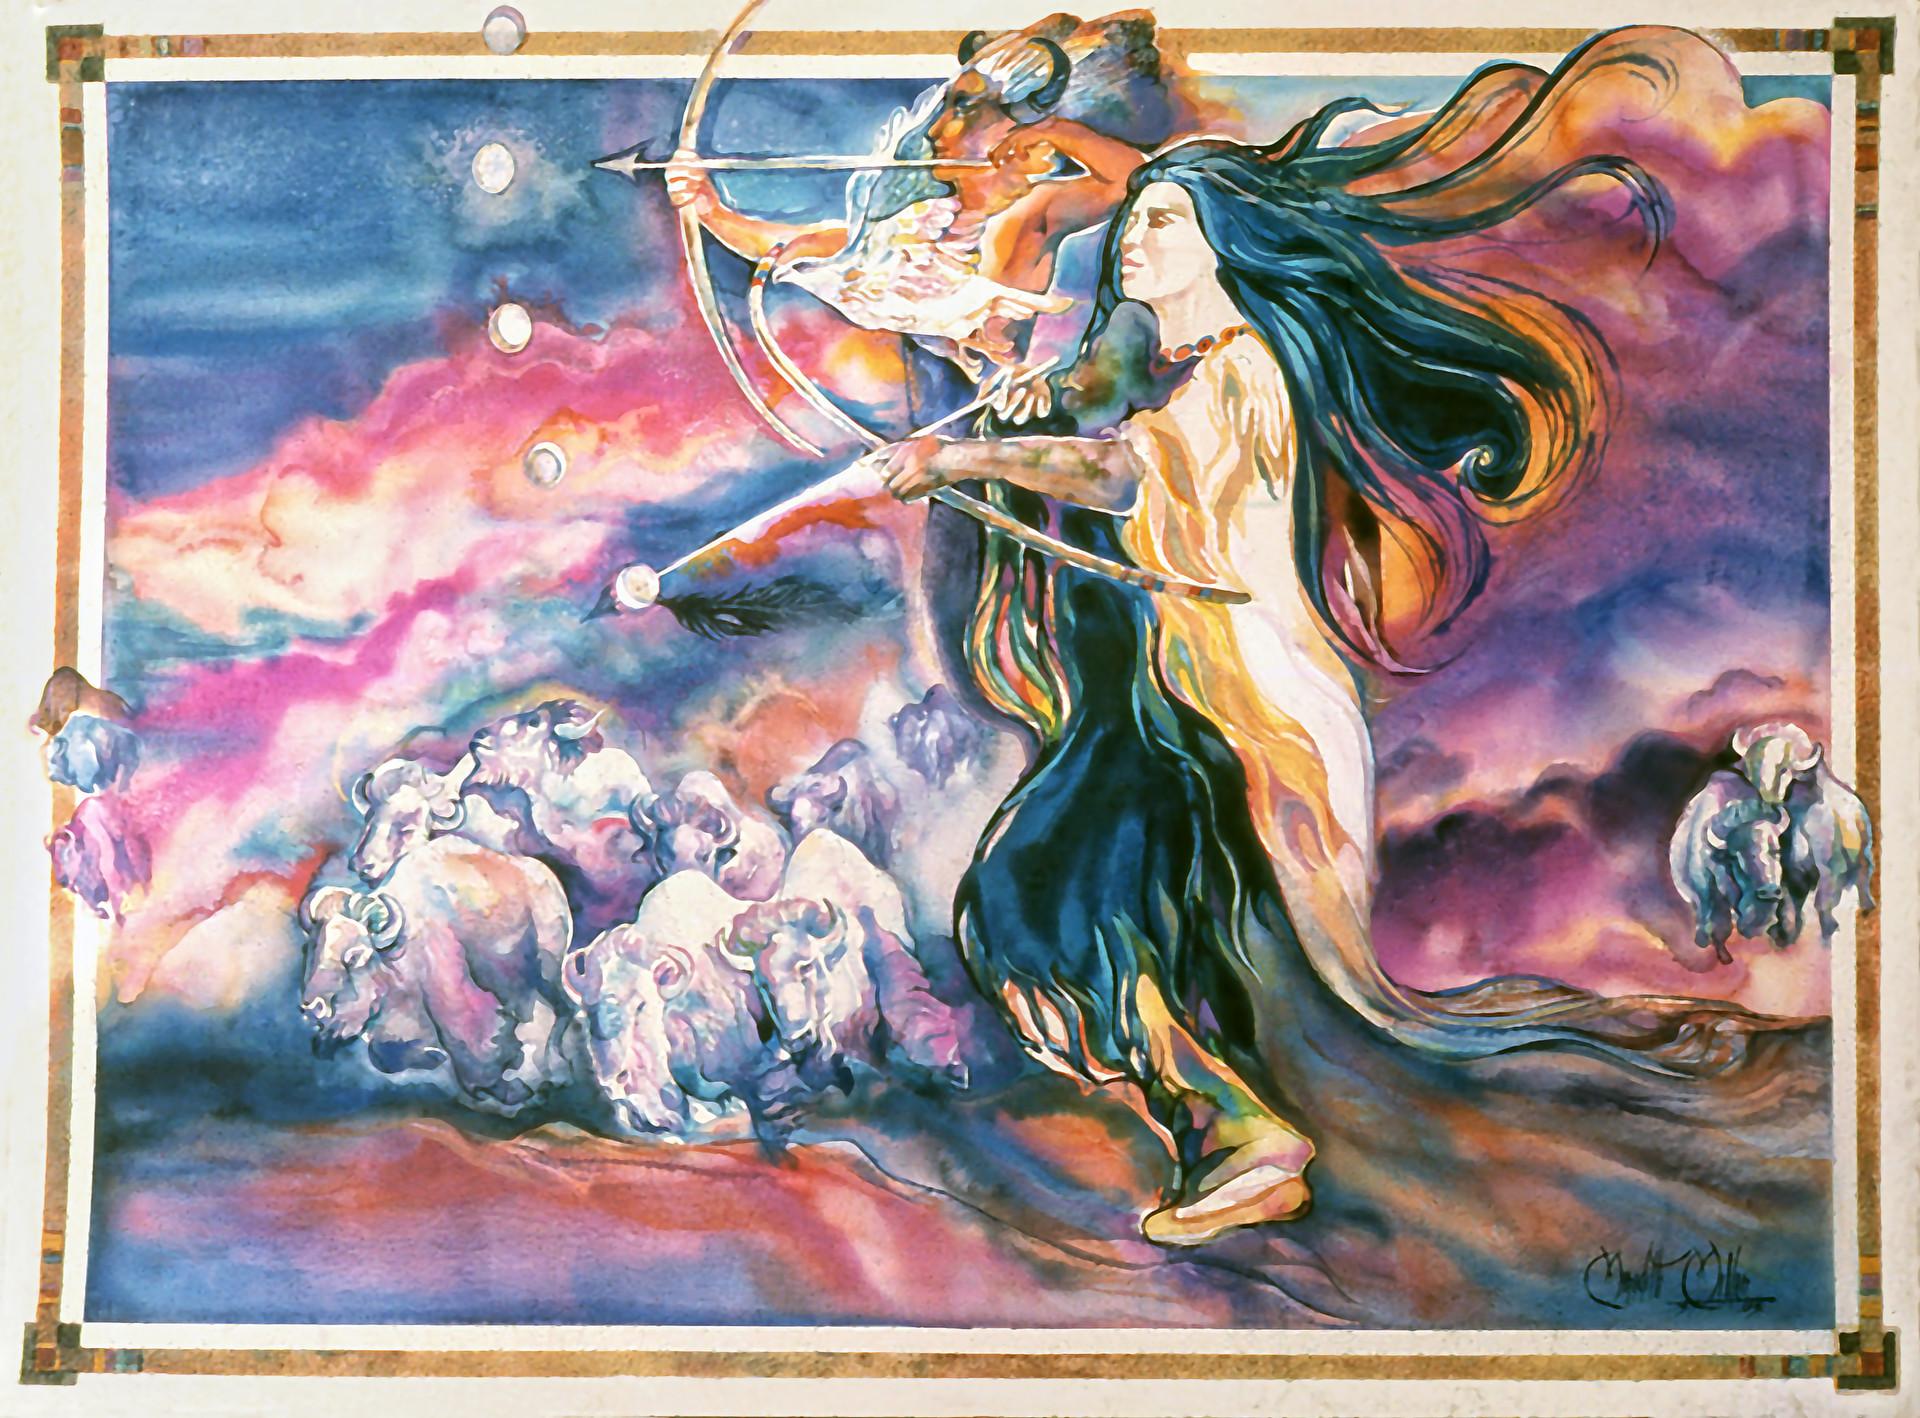 1993 - BUFFALO ARCHERS - Watercolor - 30X40